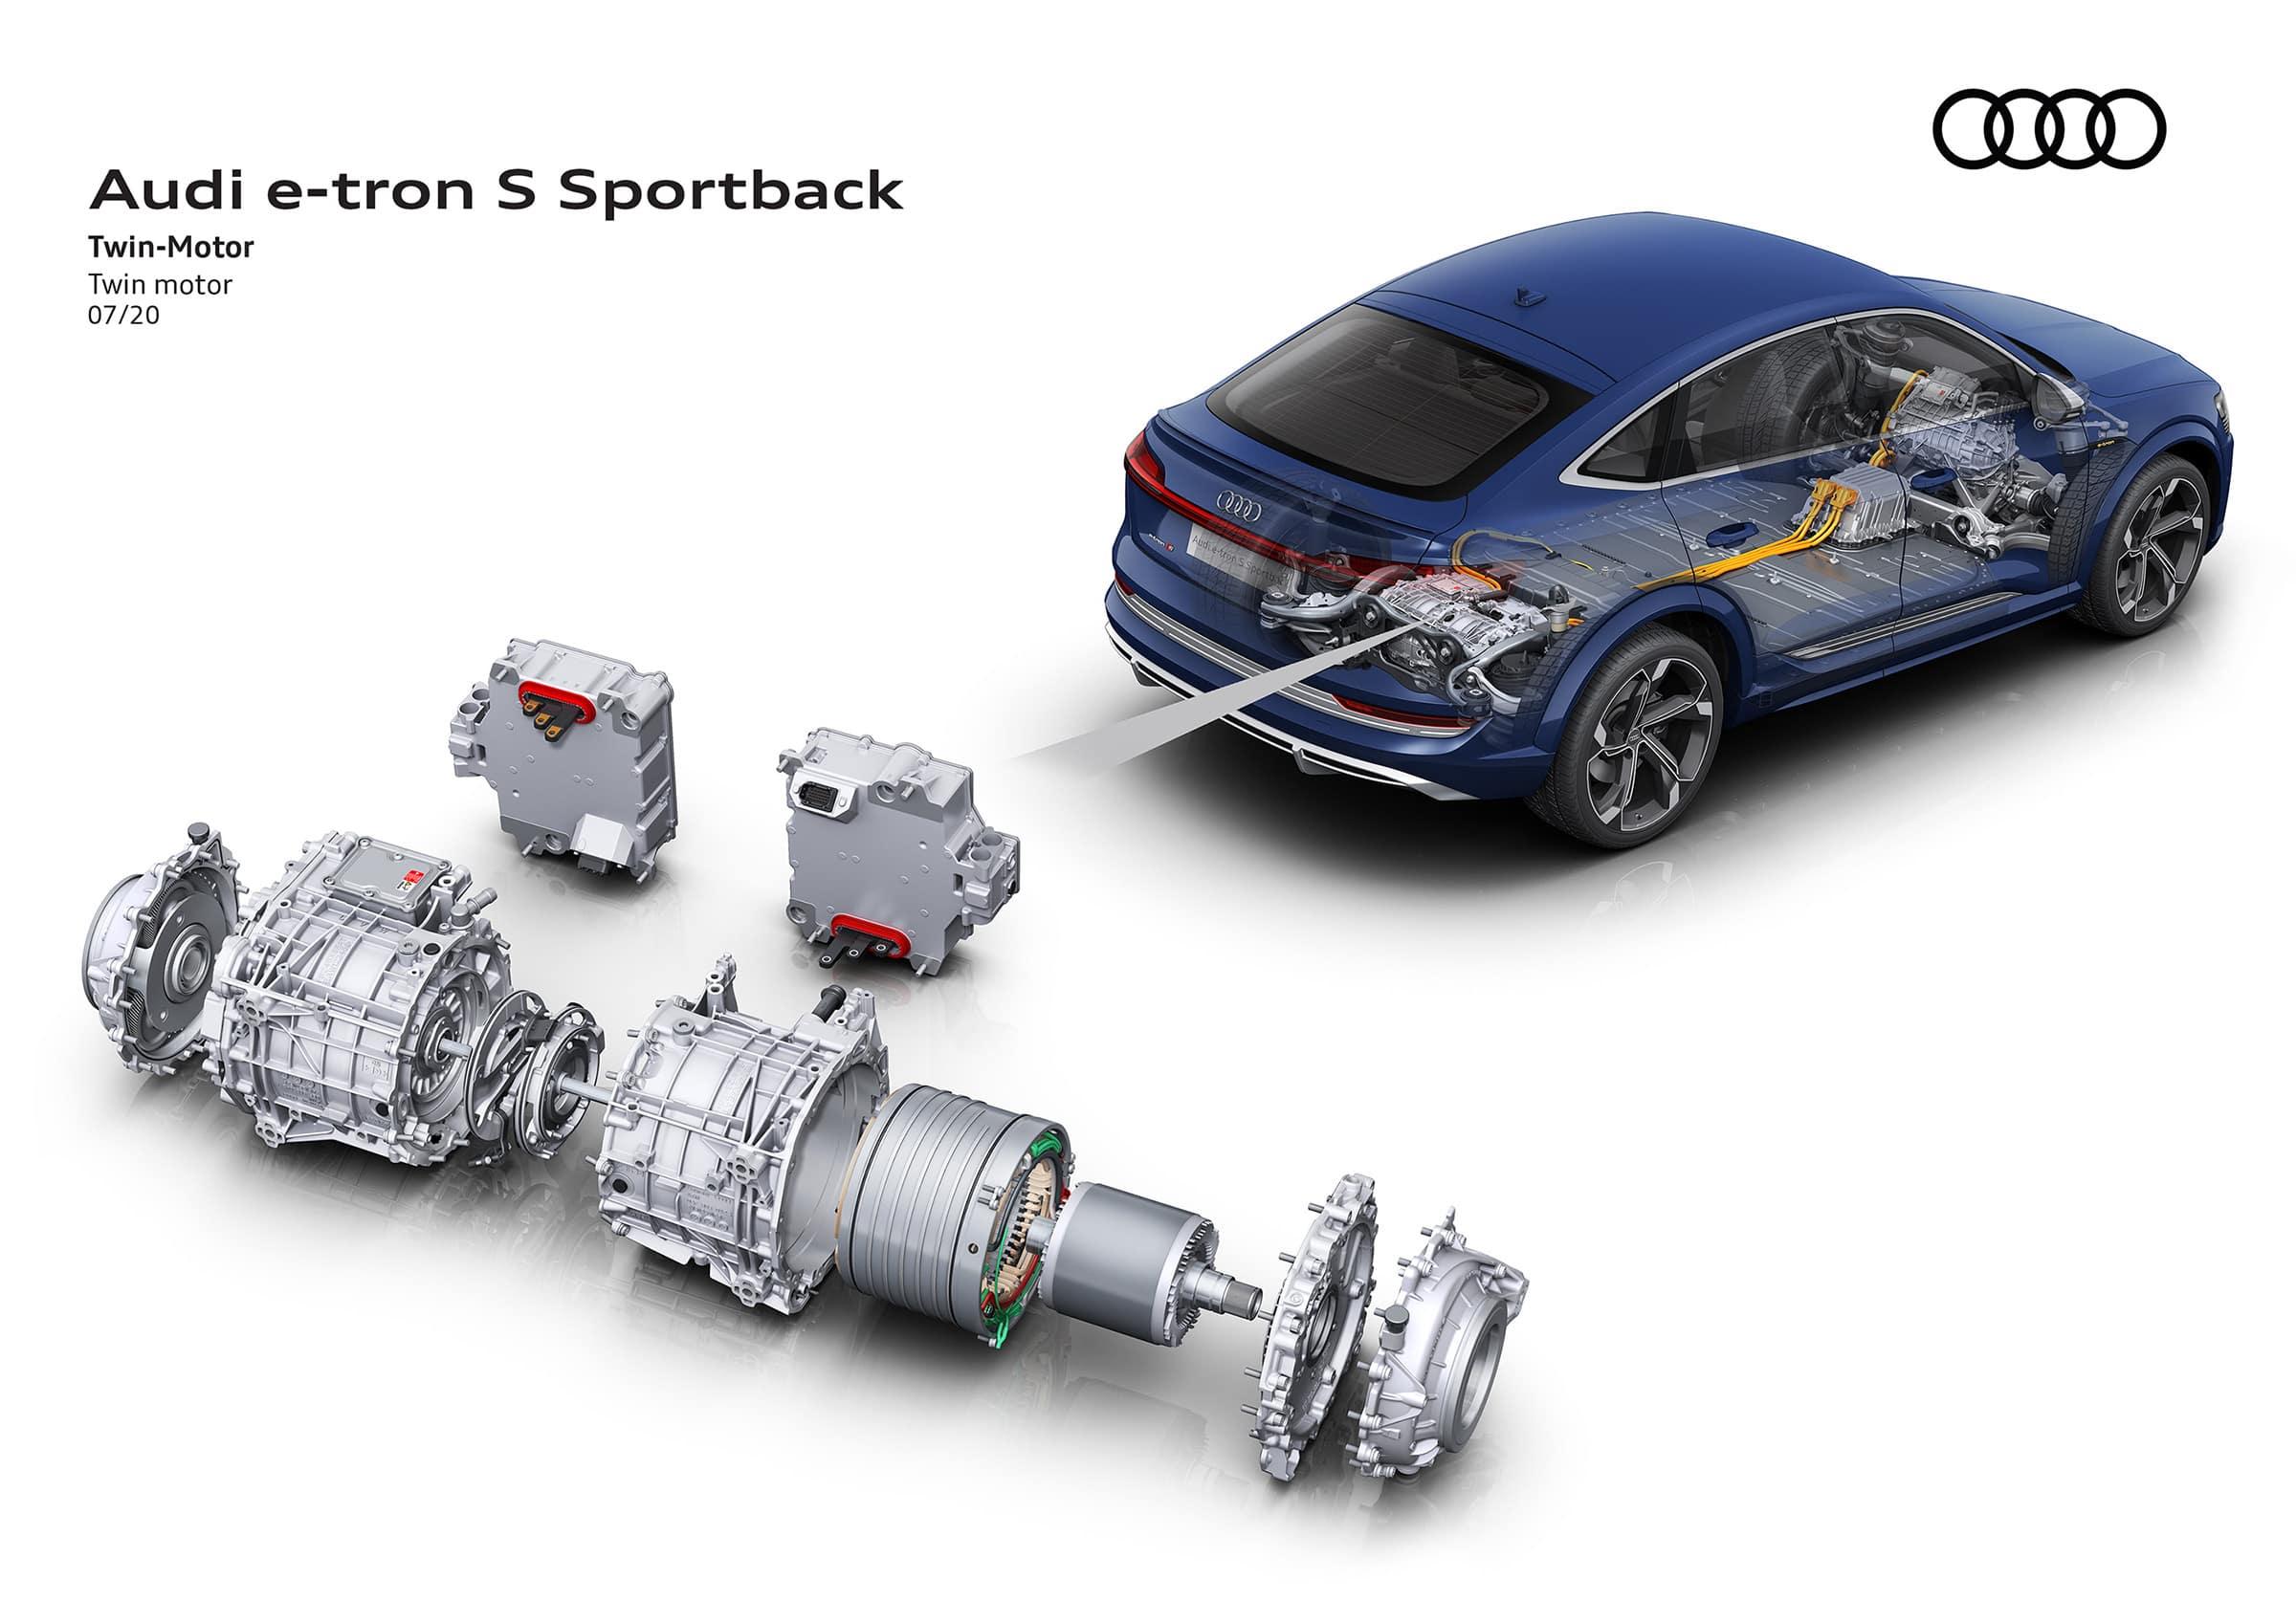 Audi e-tron S Sportback με δύο ηλεκτρικούς κινητήρες στον πίσω άξονα